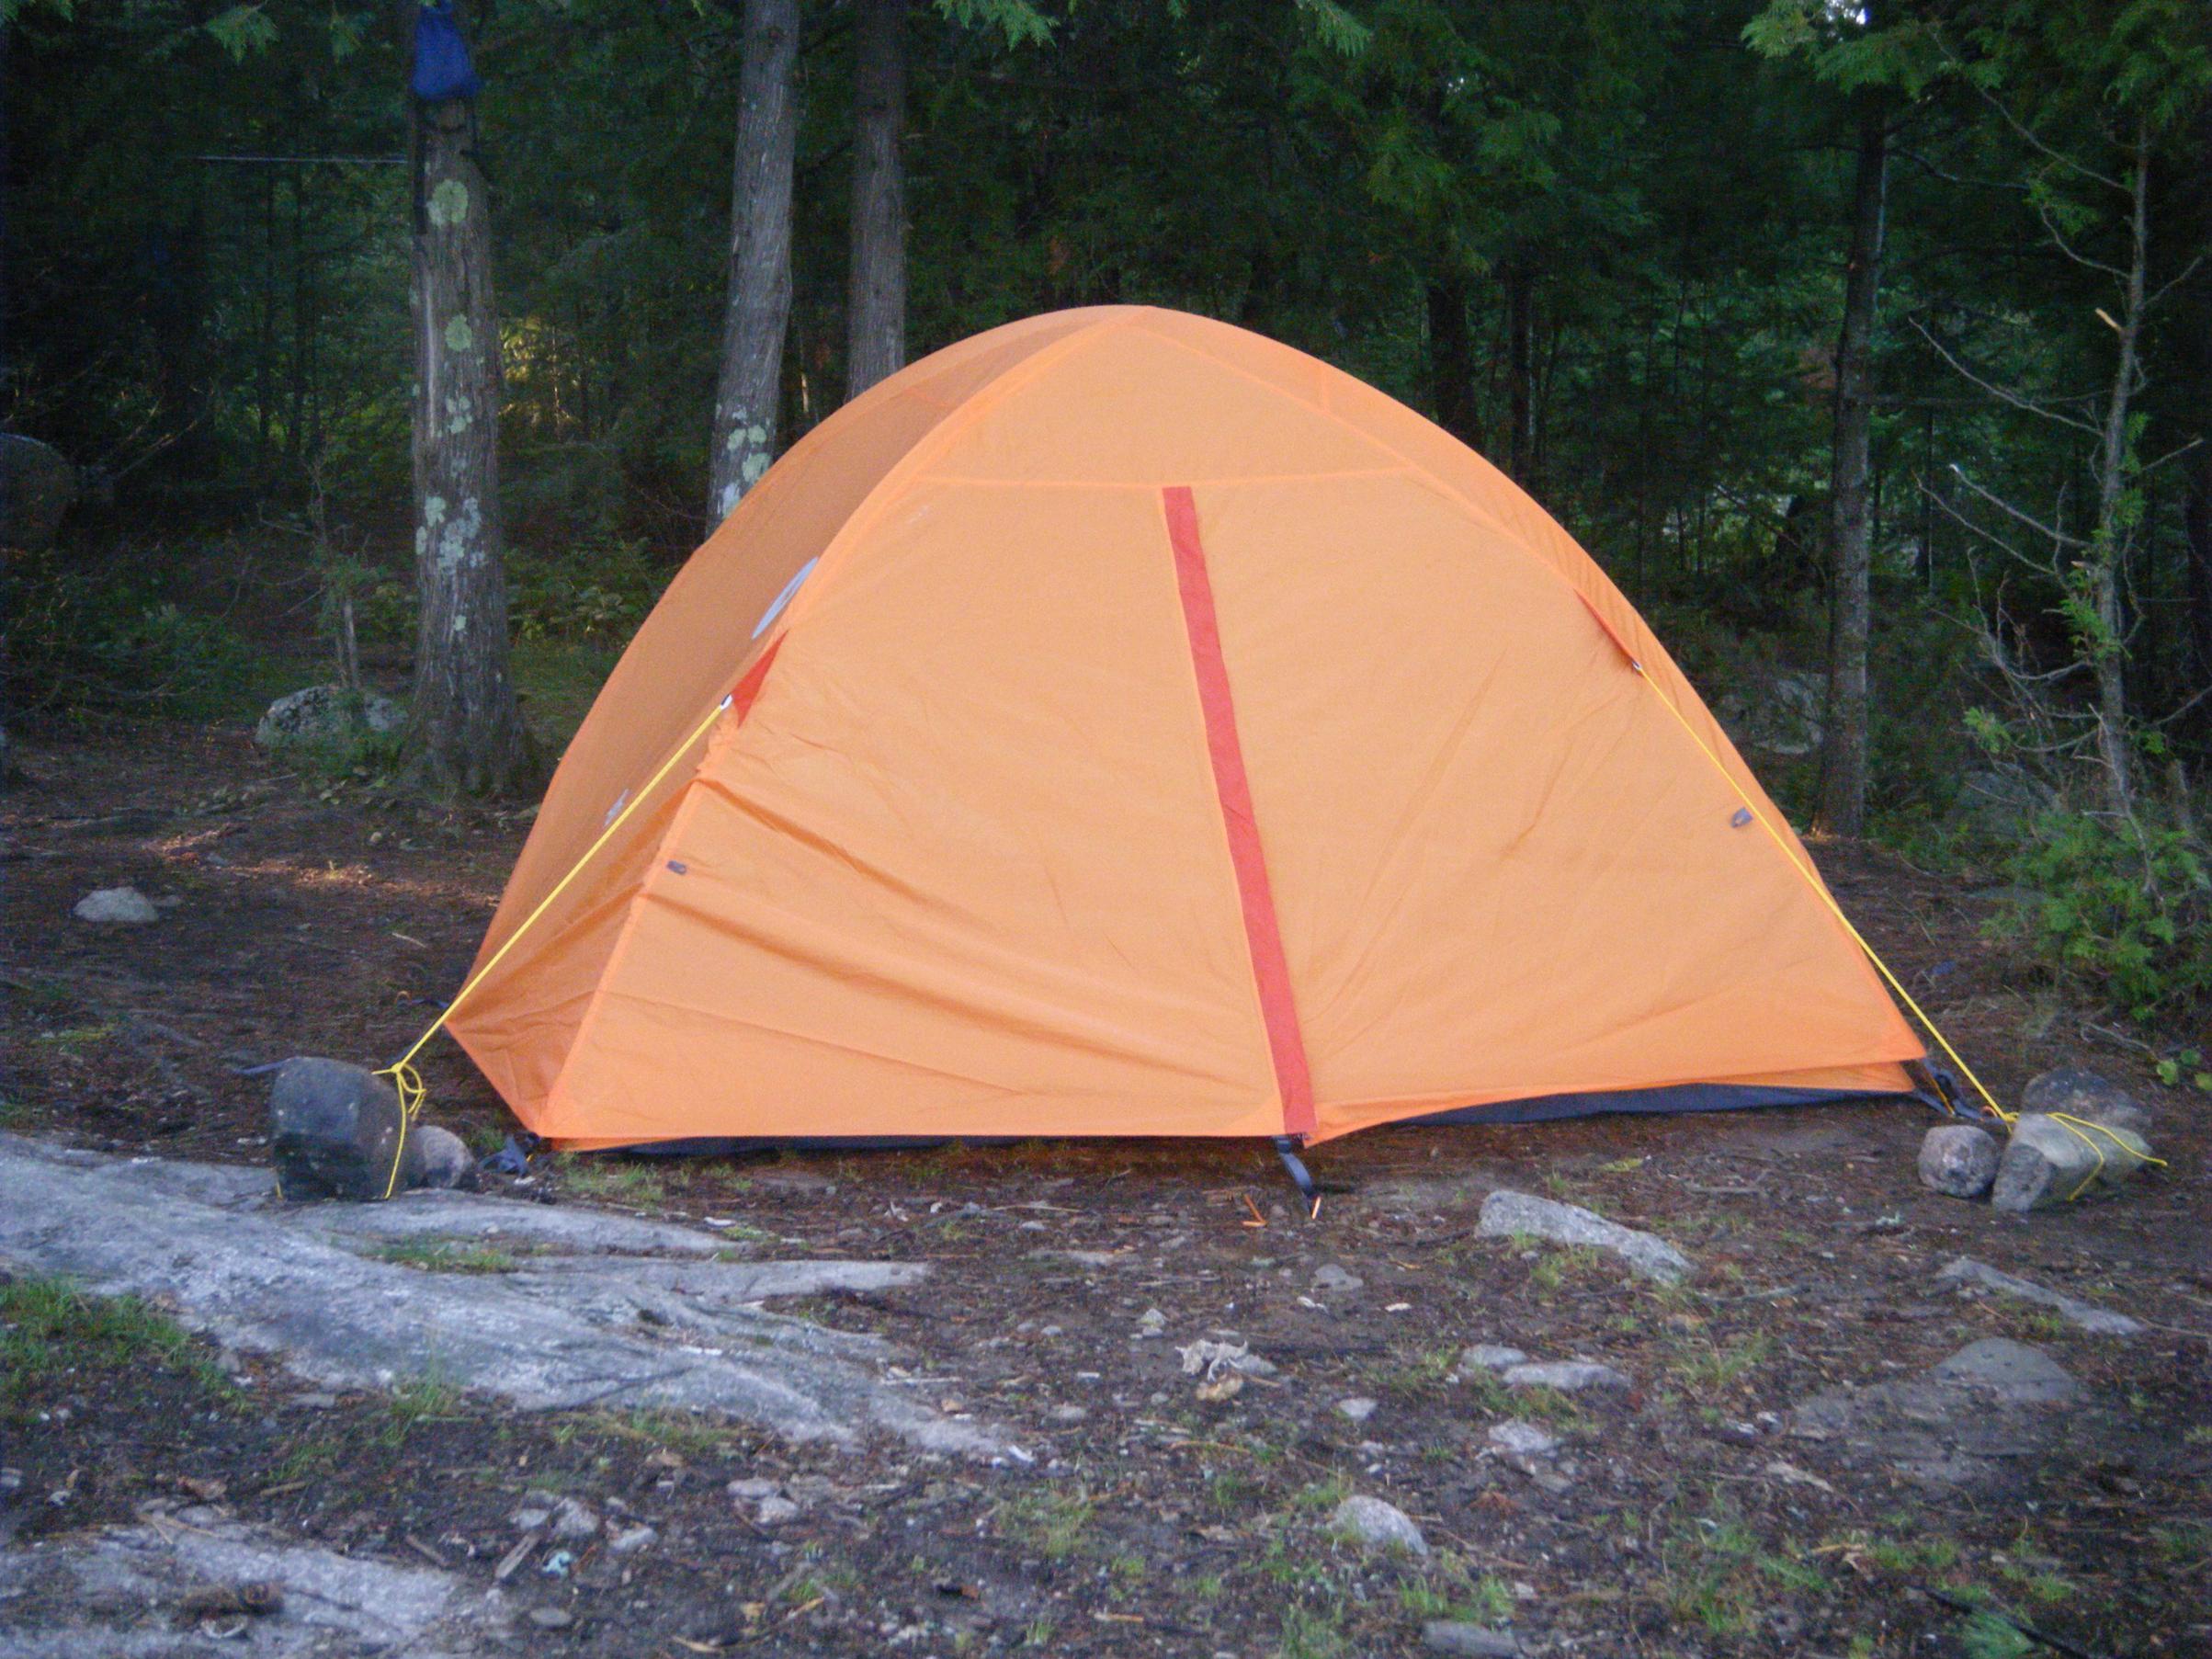 Marmot Hideaway 4 person tent. My best 2-man tent. & BWCA Best tent for 2 people? HELP! Boundary Waters Gear Forum